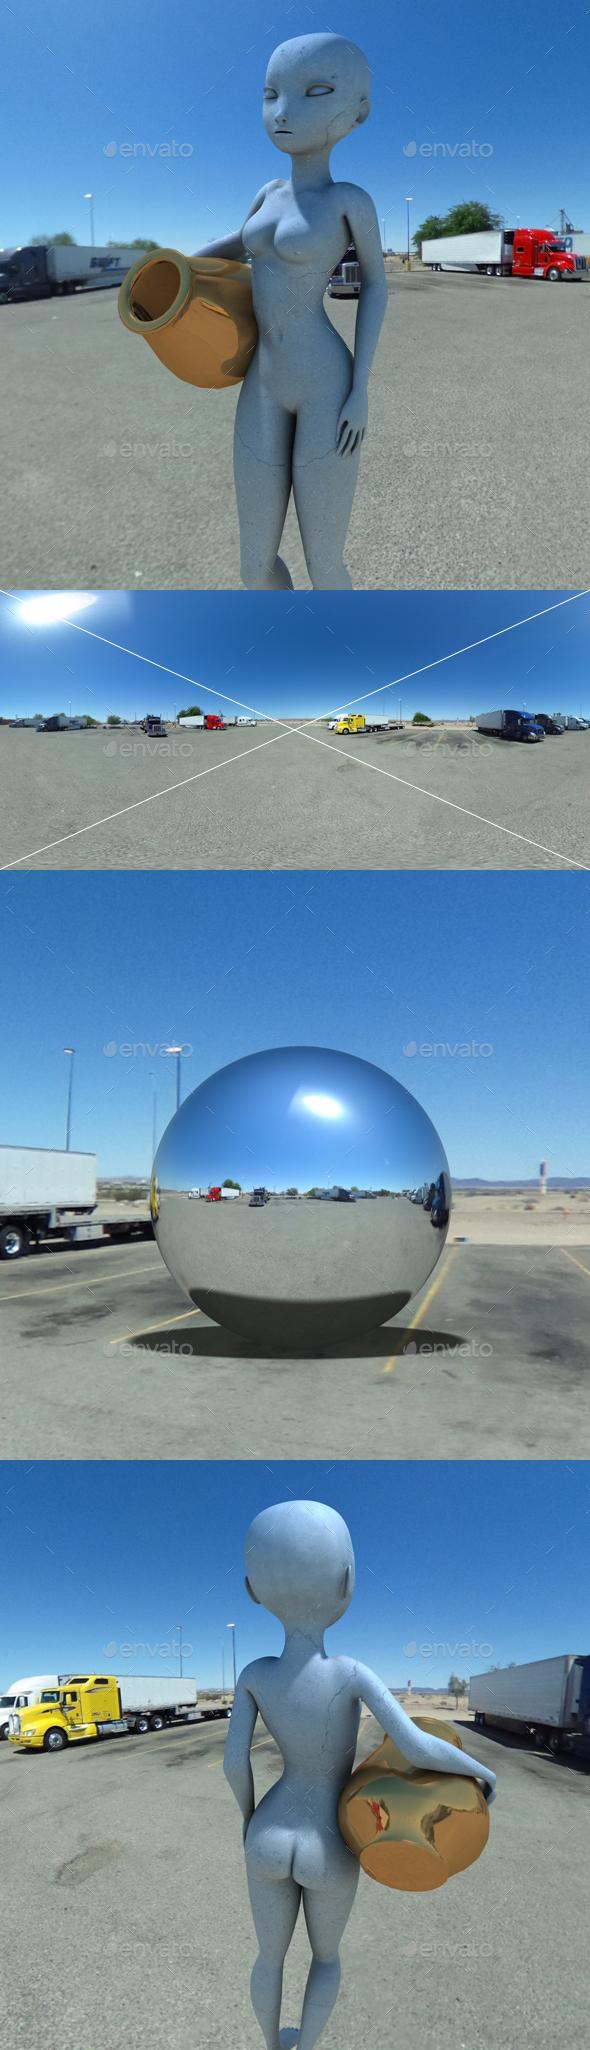 Desert Truck Stop HDRI - 3DOcean Item for Sale